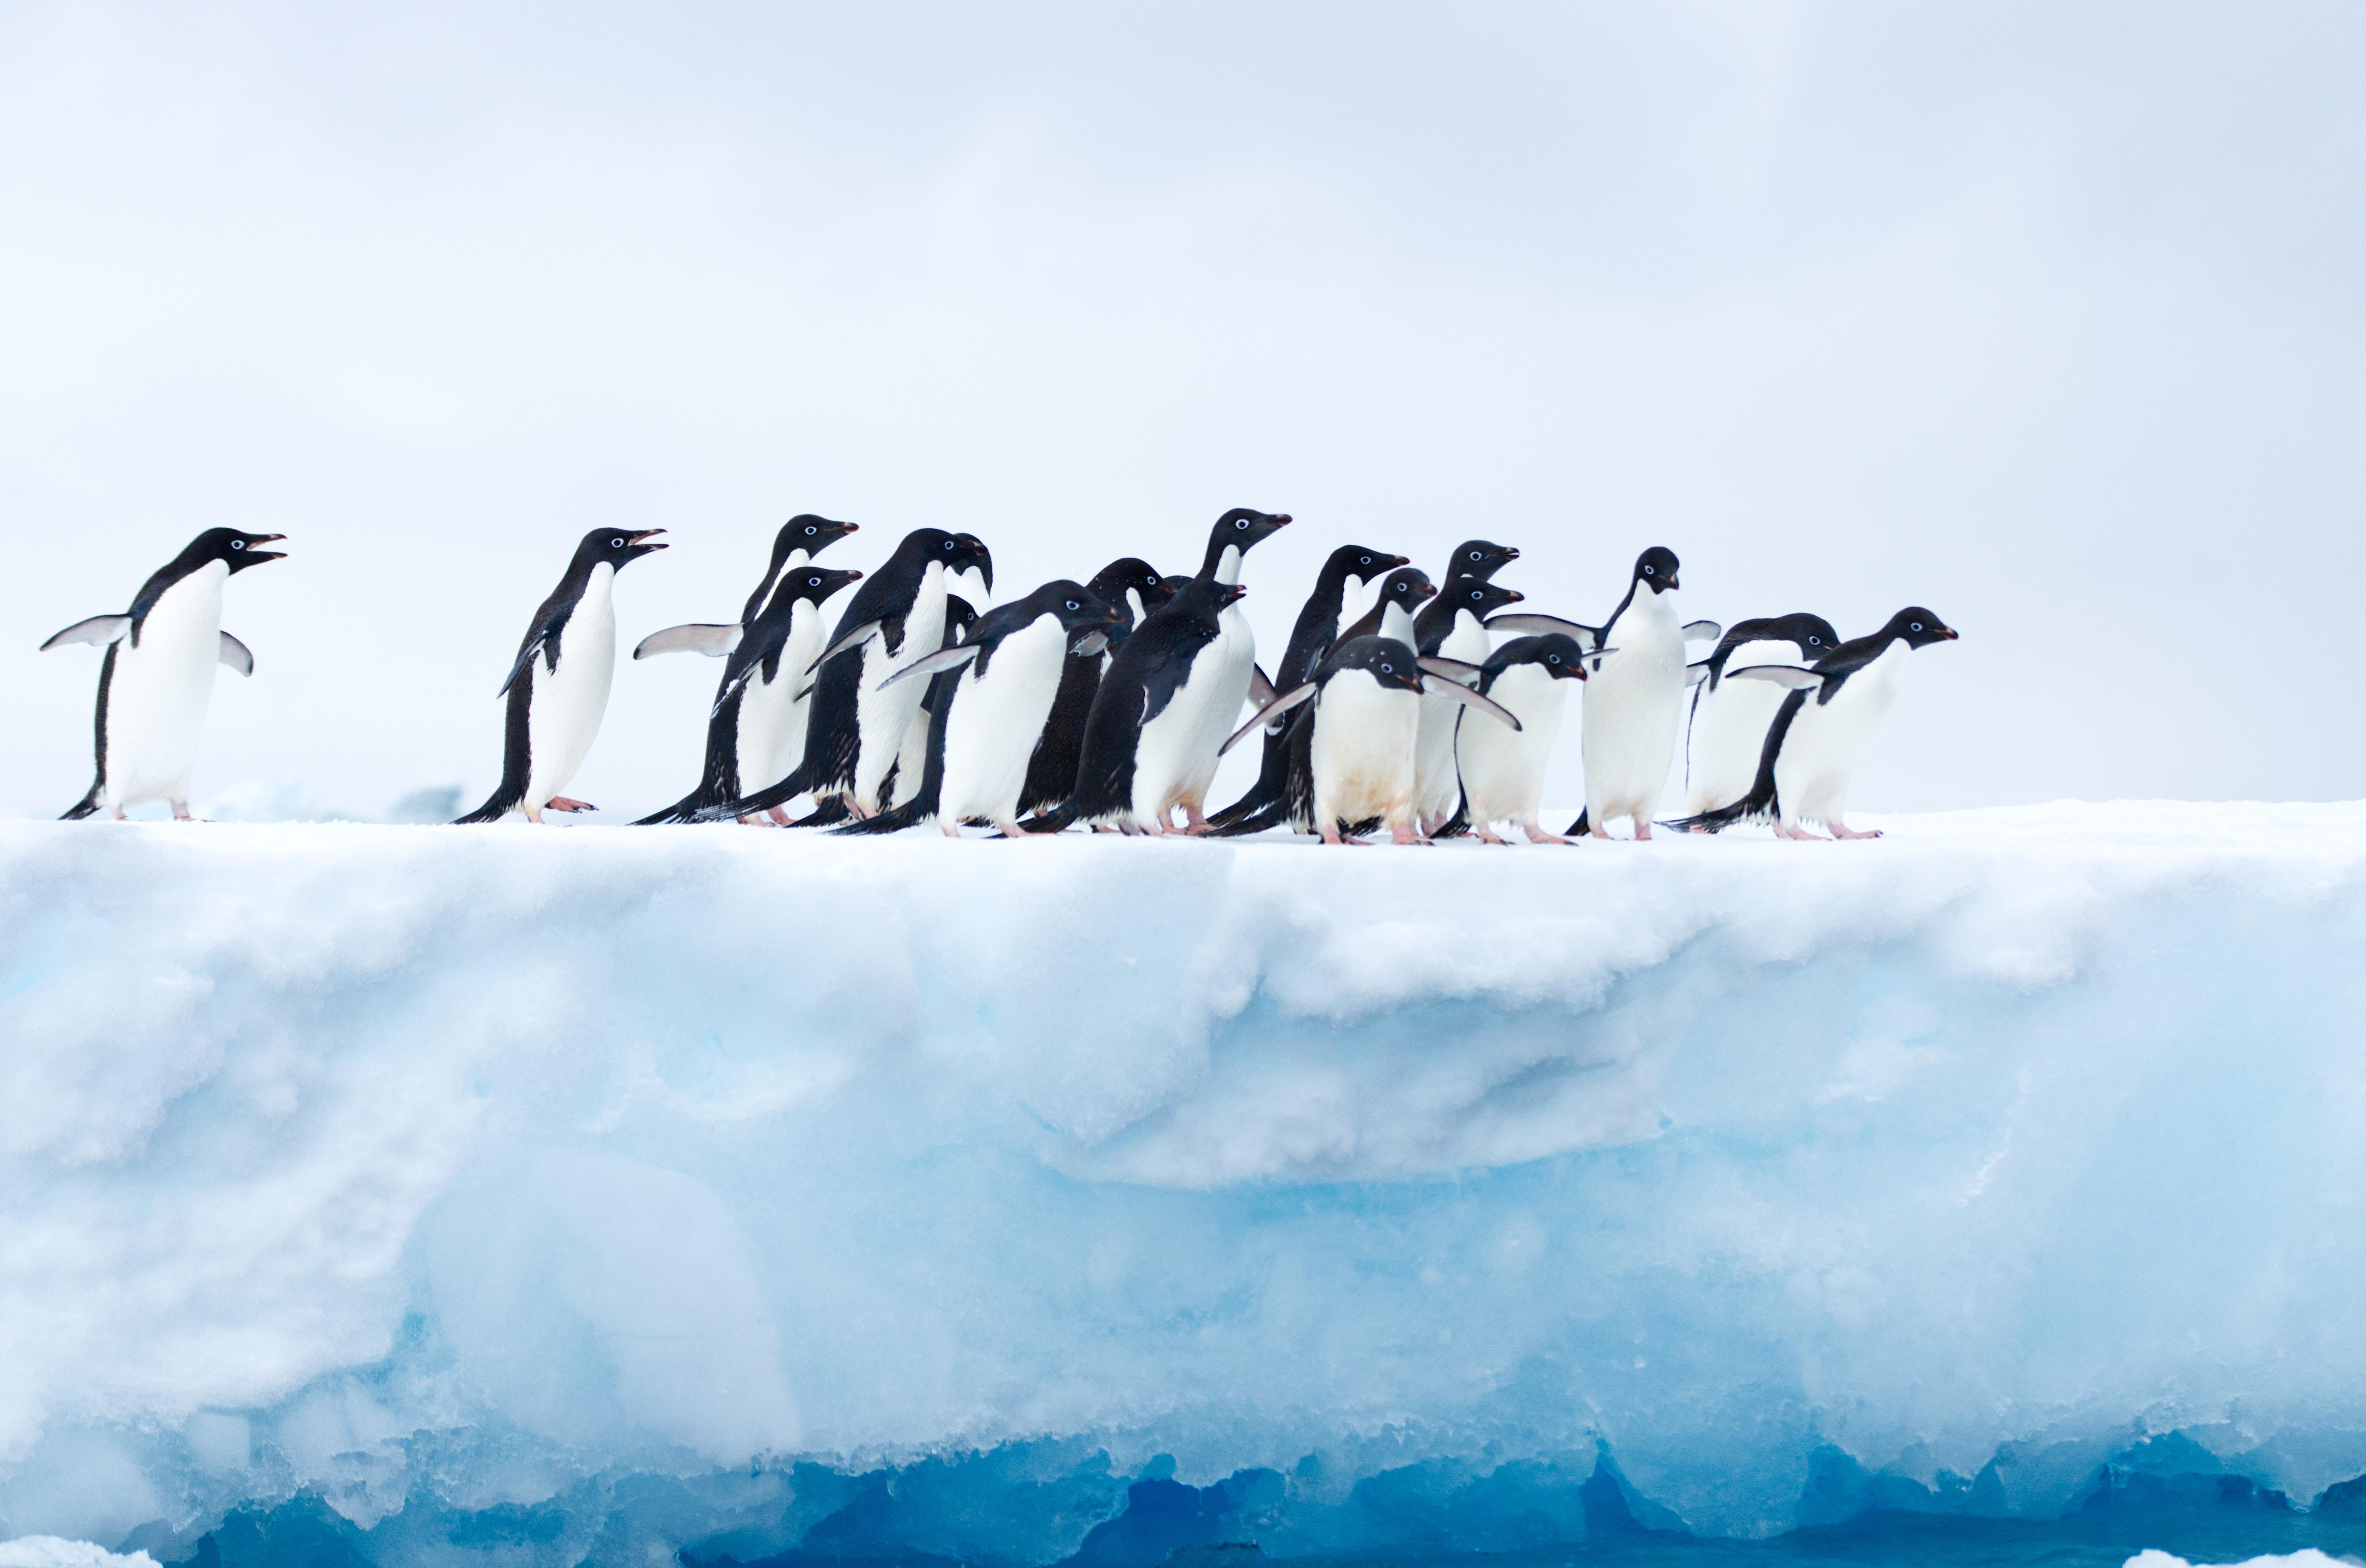 penguins in antarctica 1574938217 - Penguins In Antarctica -